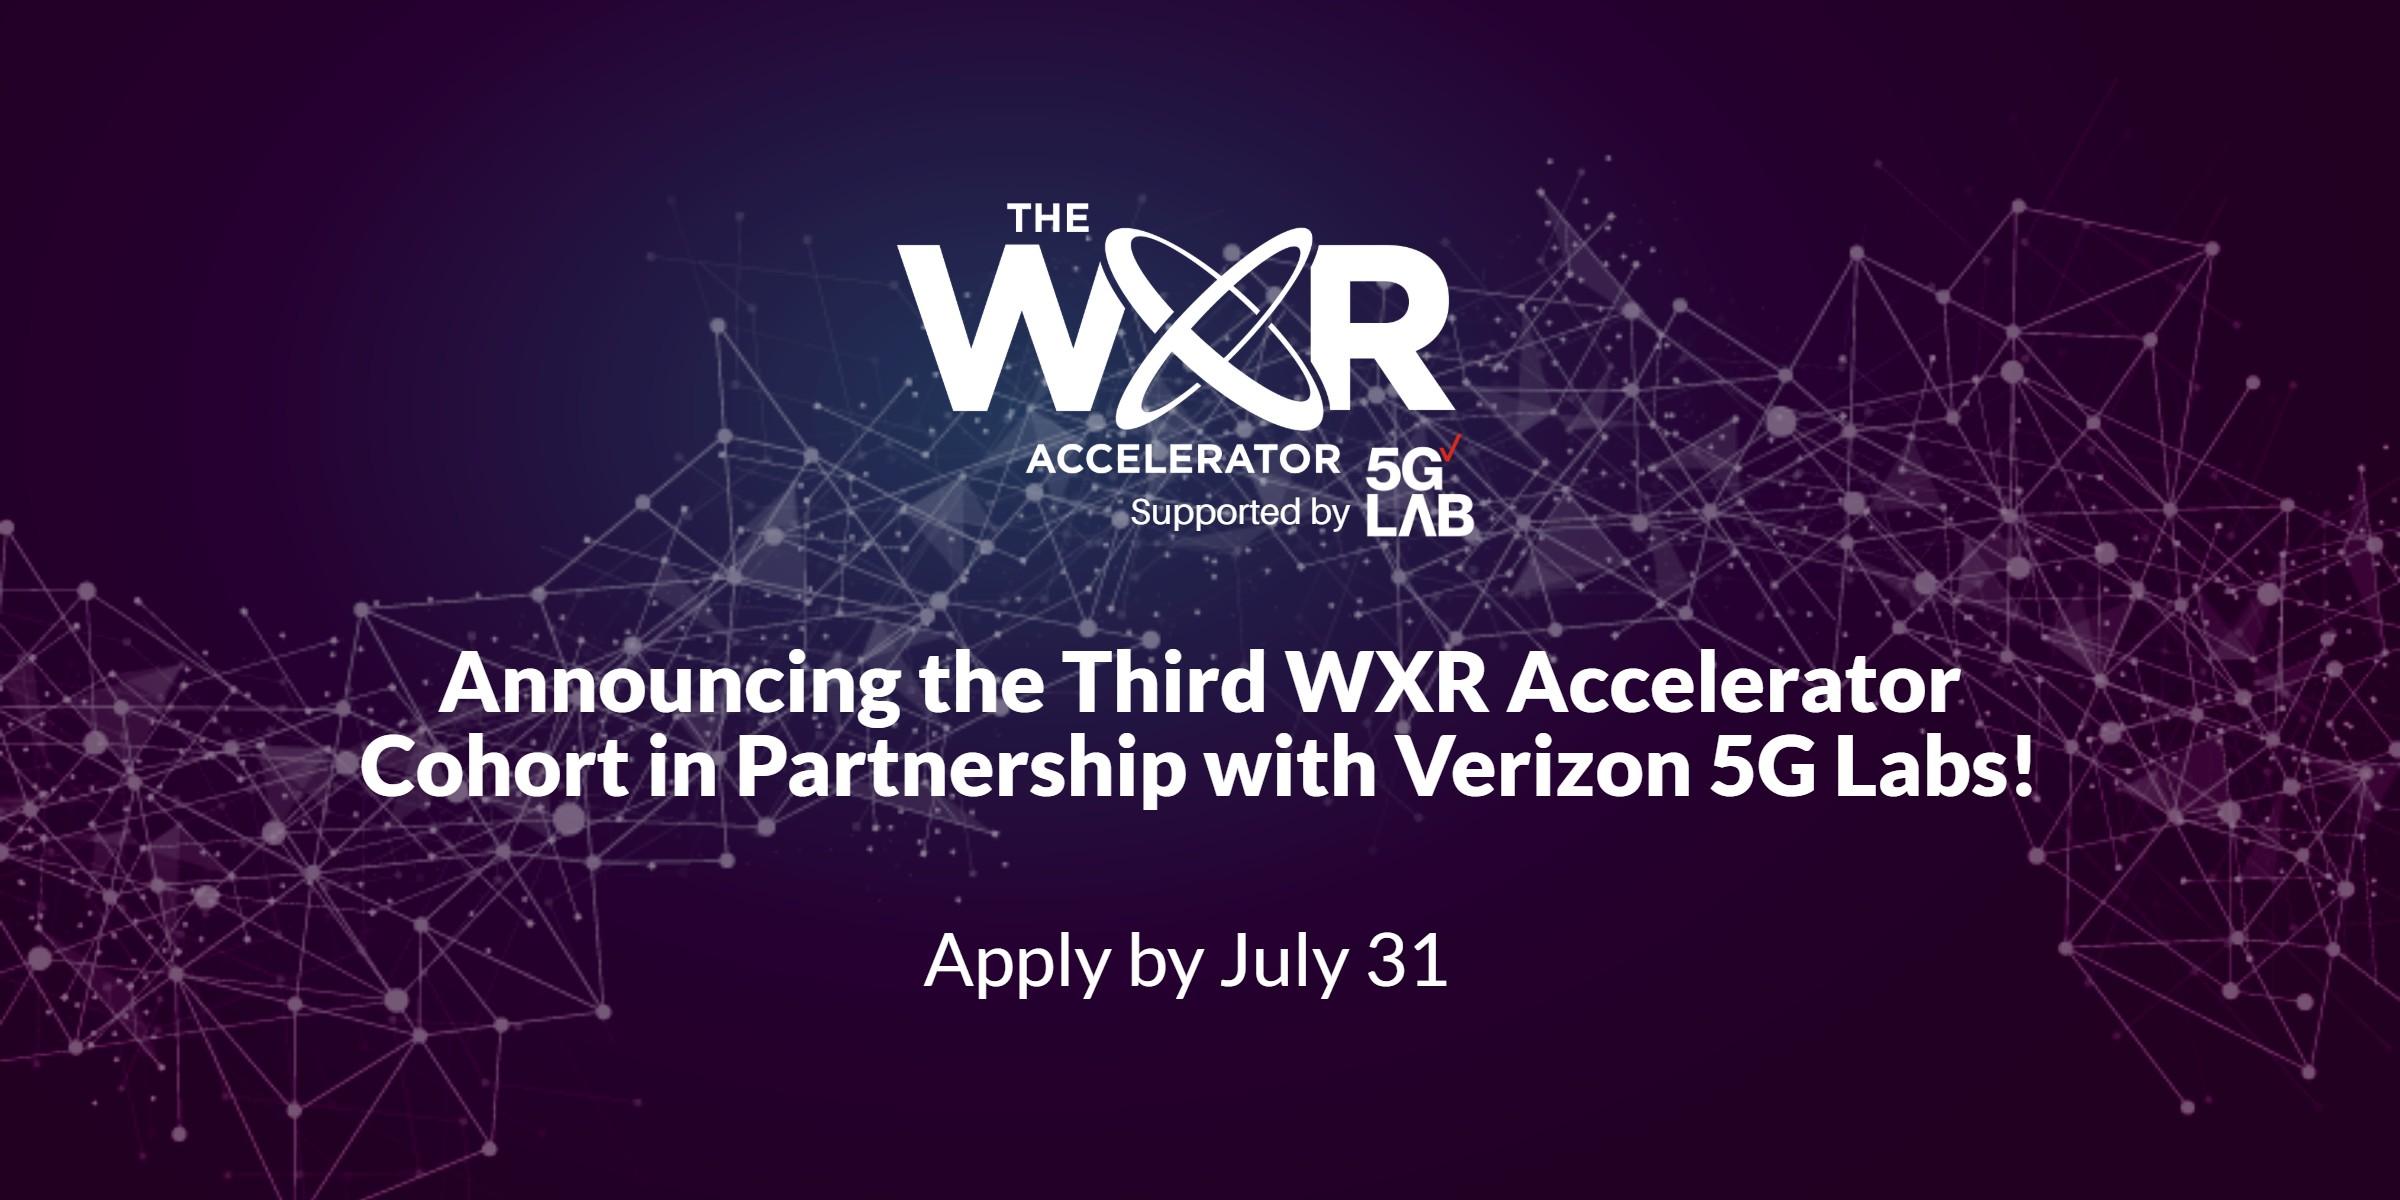 WXR-Web-Venture-Fund-Accelerator-5G-Labs-Verizon-WXR Cohort-WXR-Mentorship-Women-In-XR-Spatial-Computing-AI.jpg